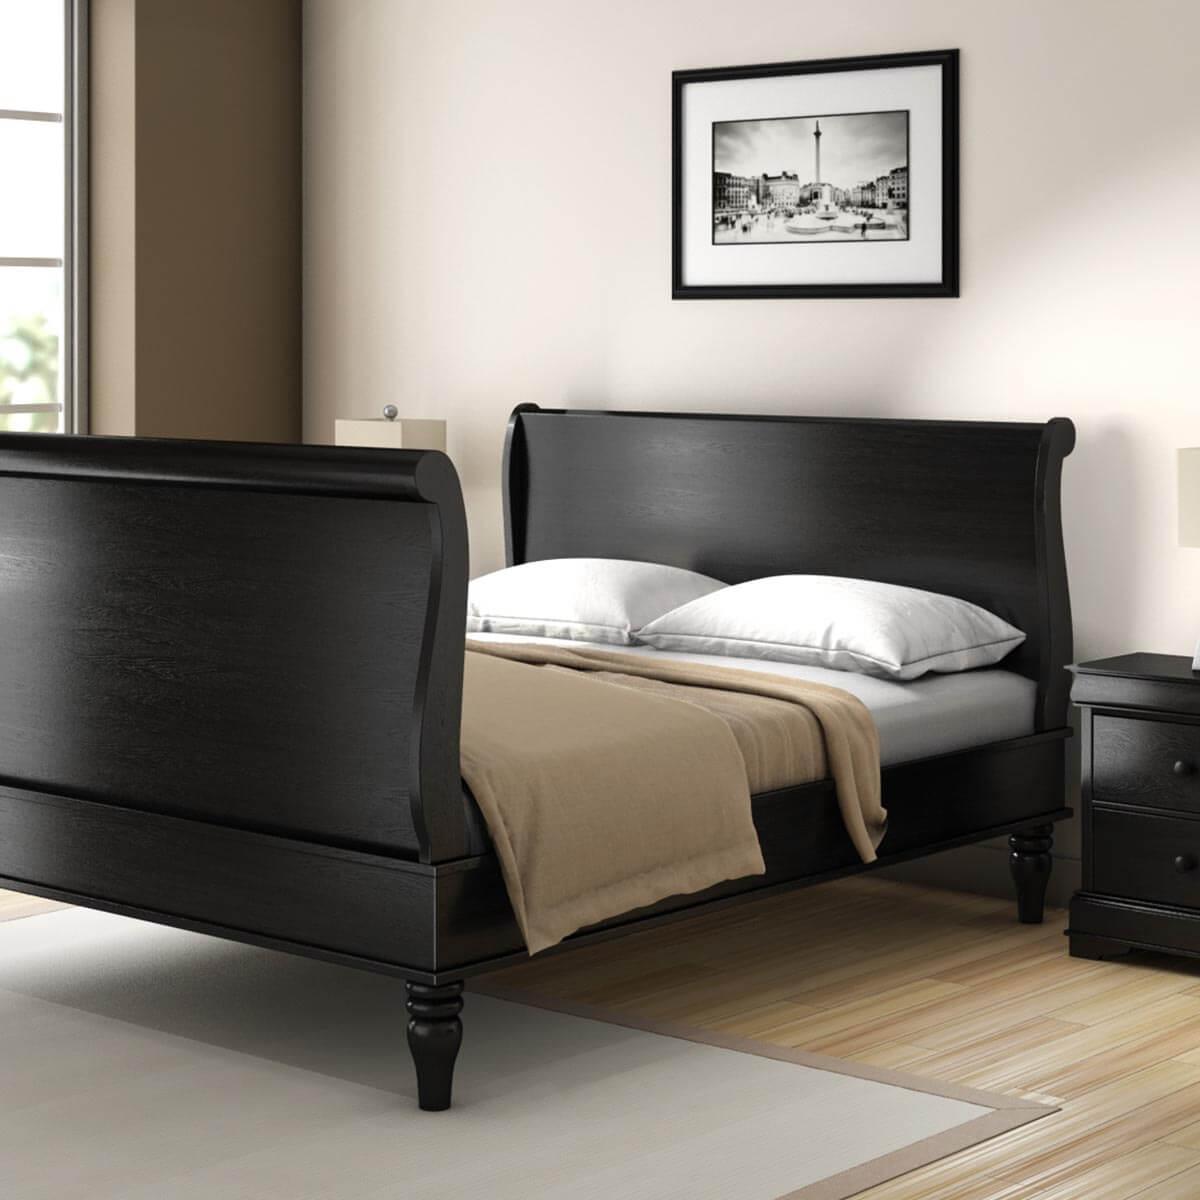 Midnight Empire Solid Wood Platform Bed Frame